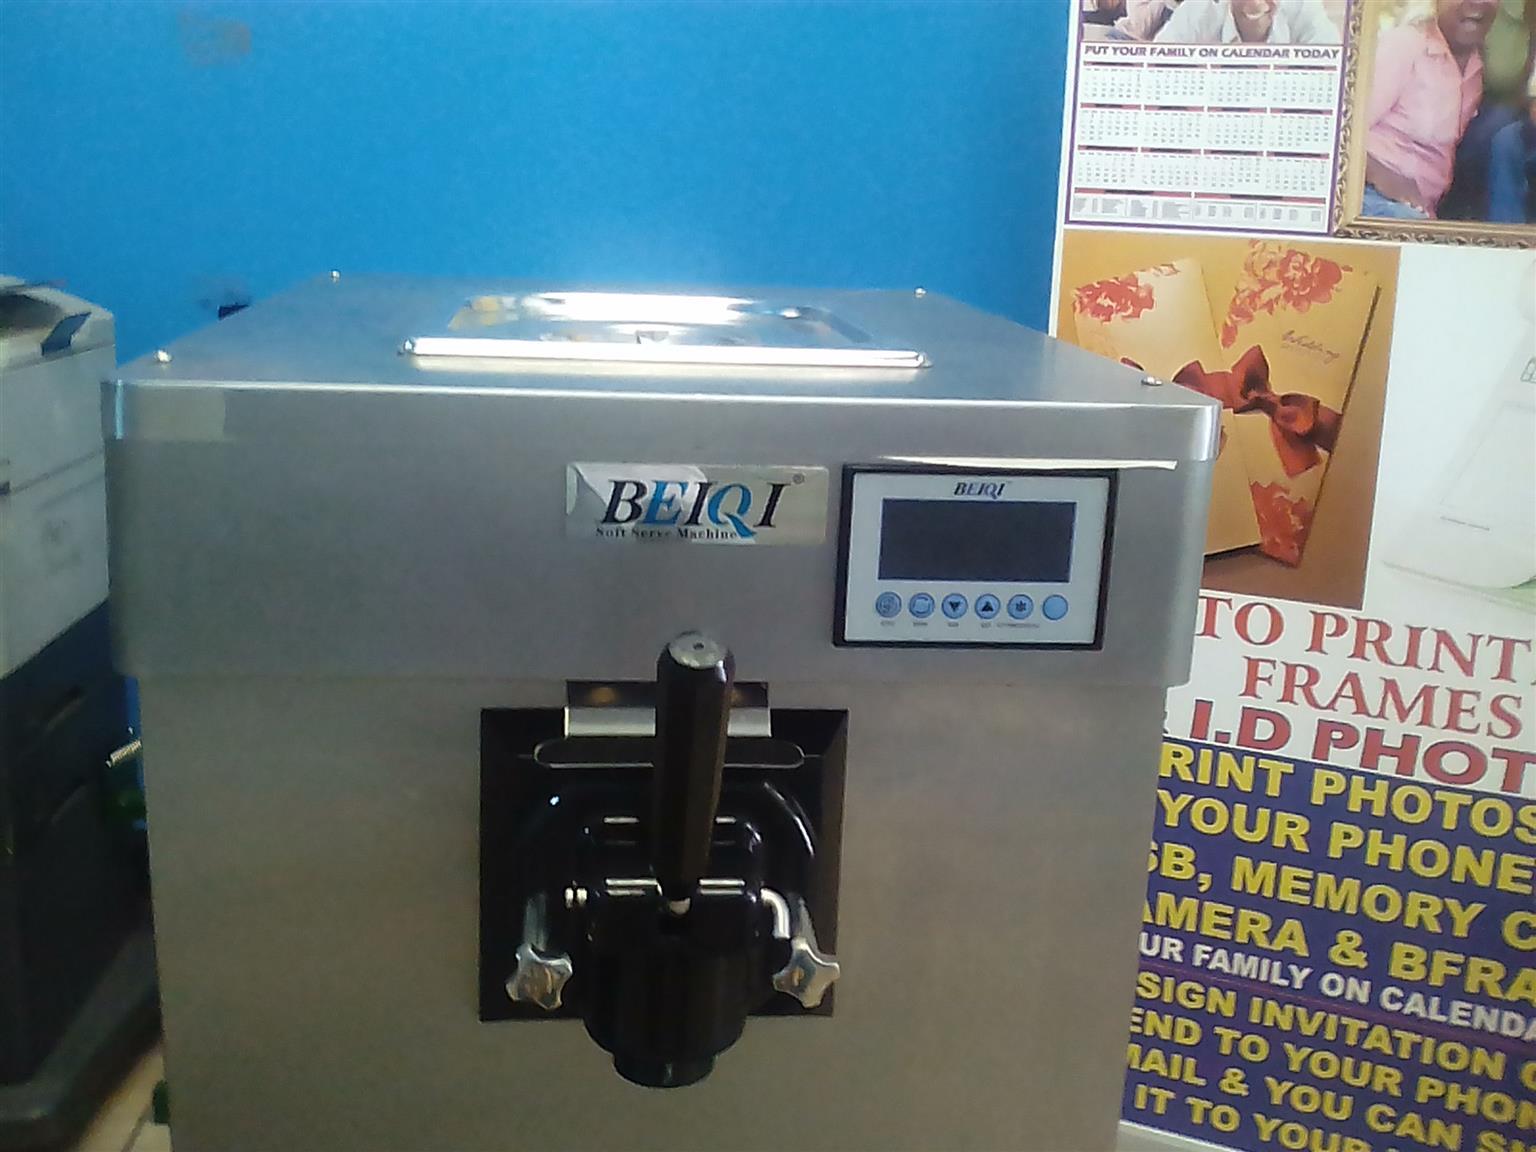 LATEST MODEL ICE CREAM MACHINE WHICH COUNT ICE CREAMS SOLD PER DAY